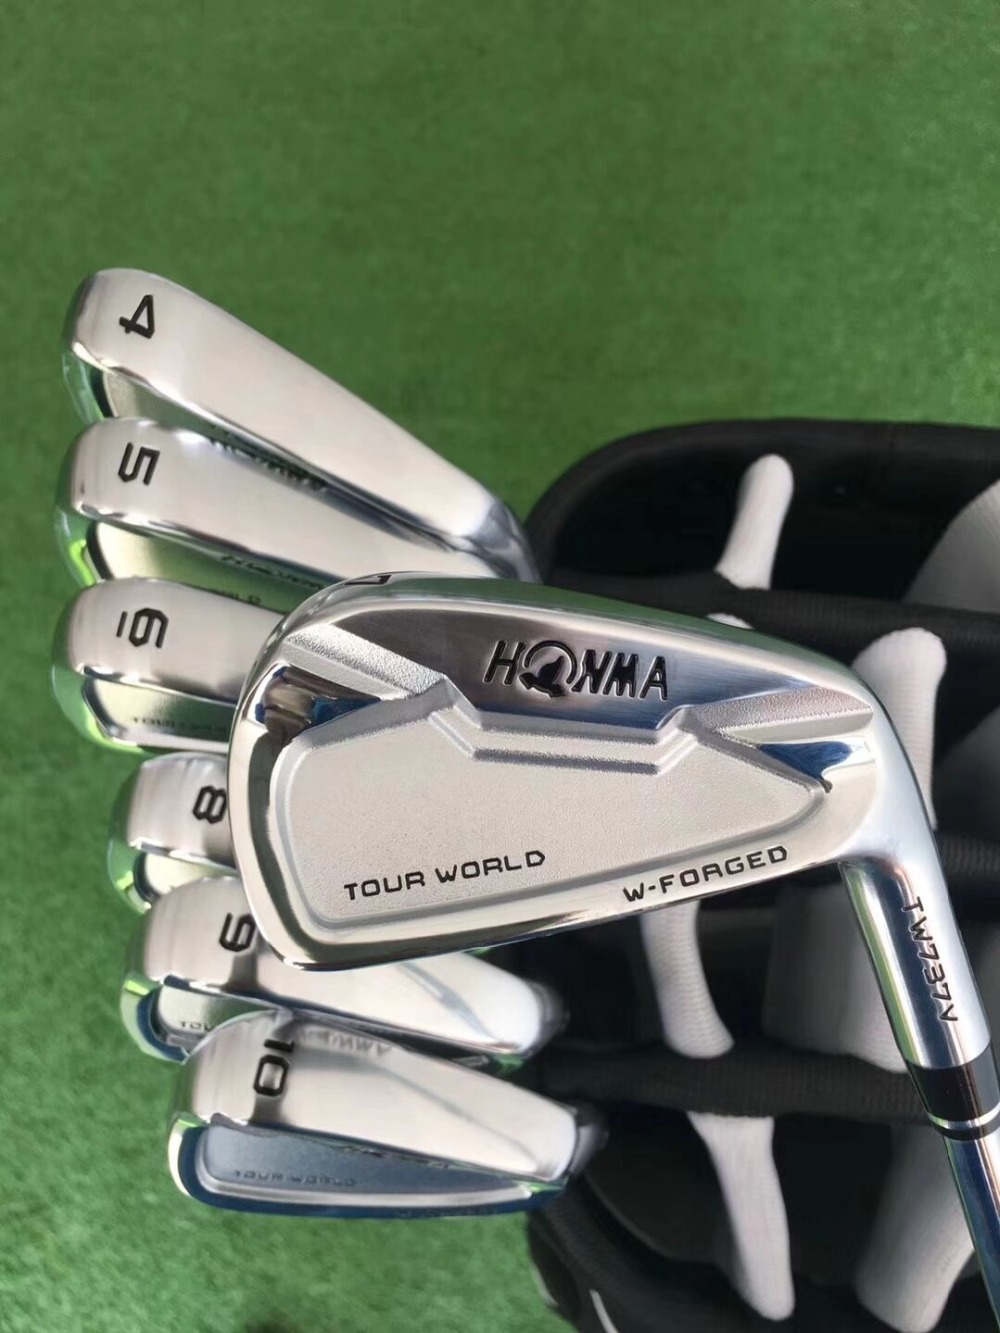 HONMA TOUR WORLD TW737V Golf Irons set 4 10 Irons Clubs